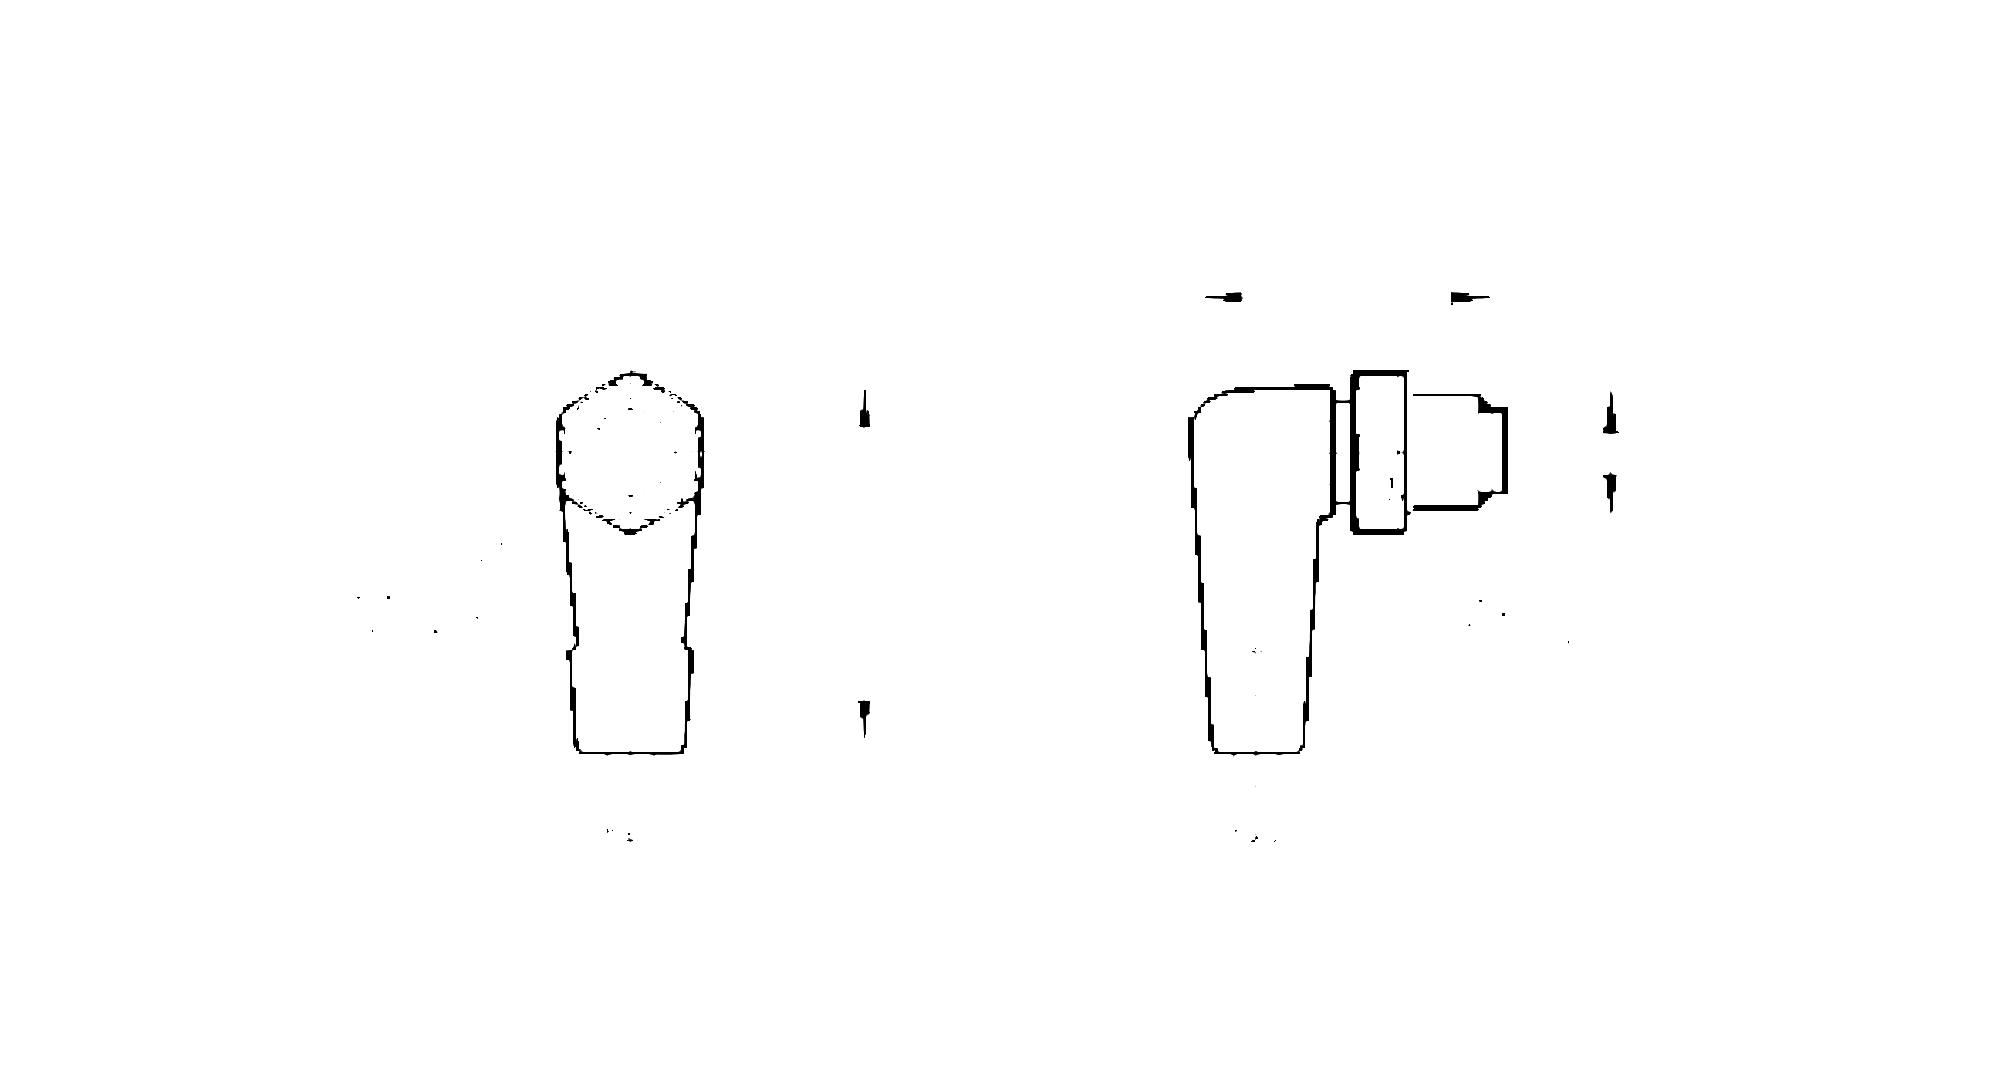 evt090 - male cordsets